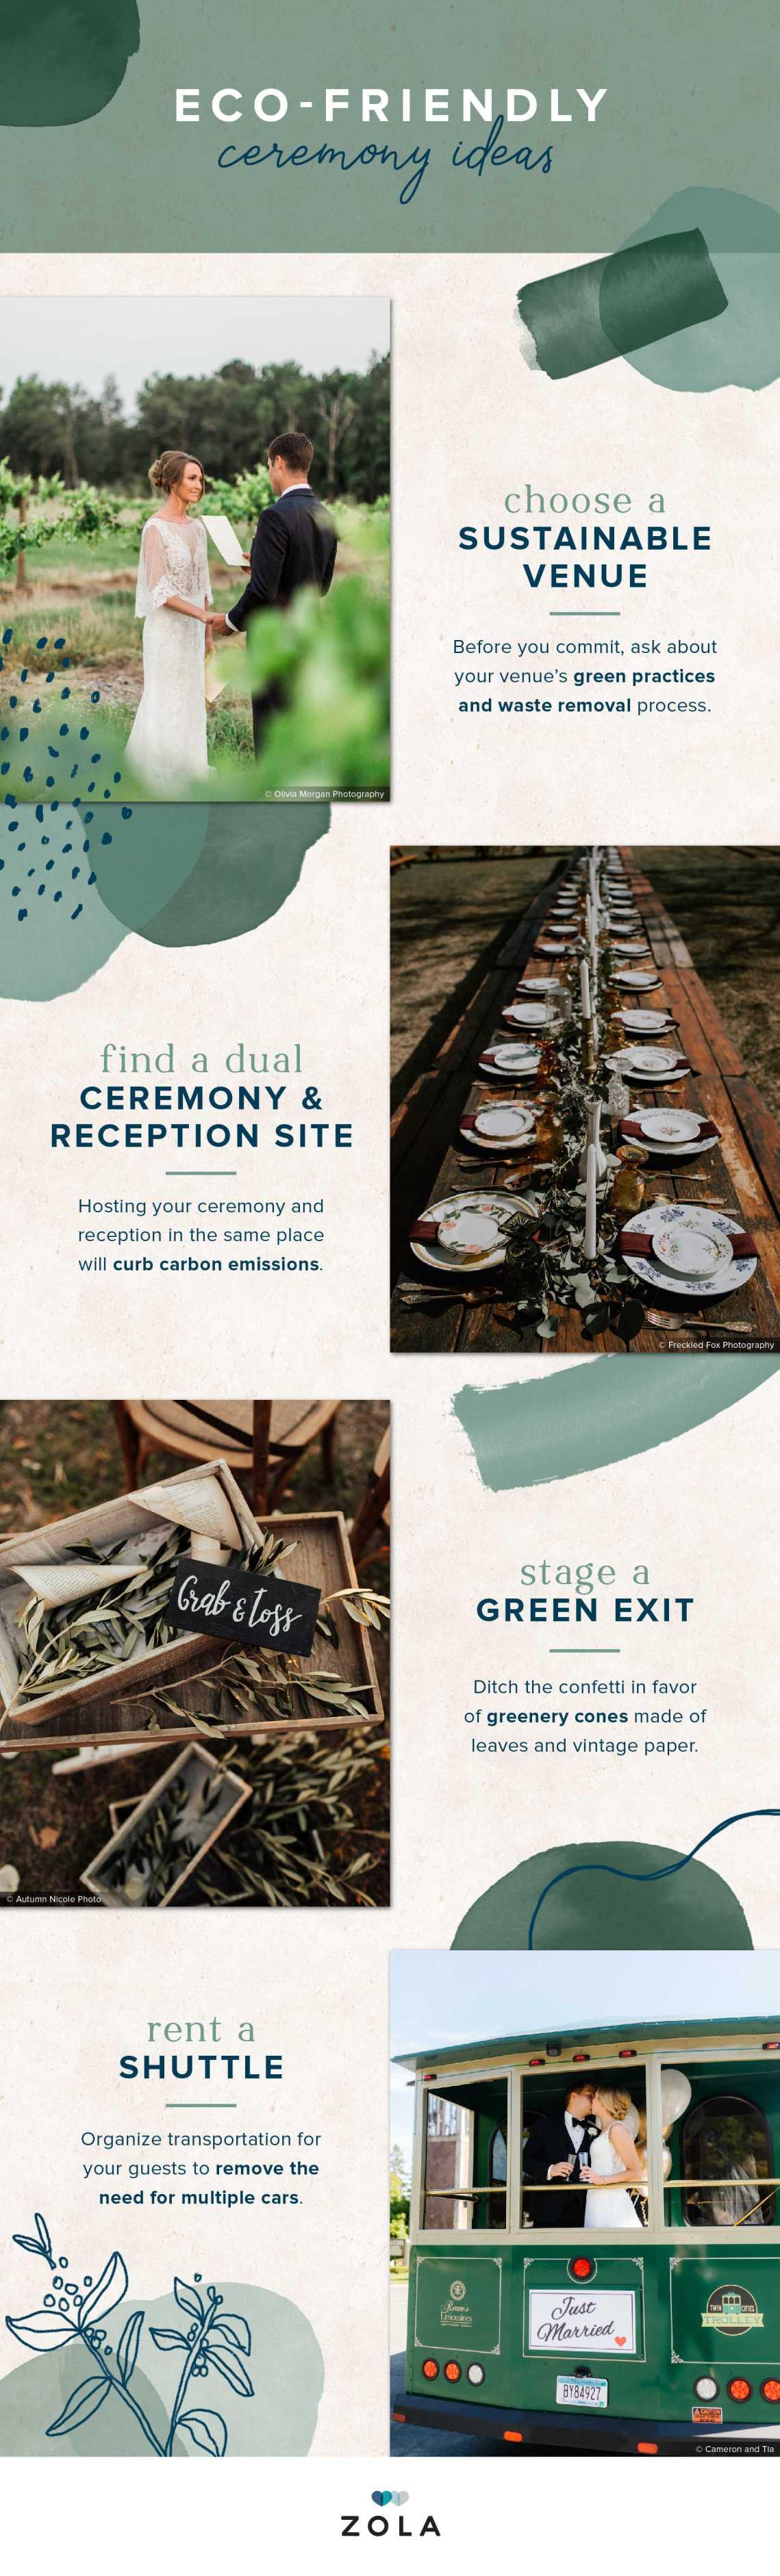 eco-friendly-ceremony-ideas